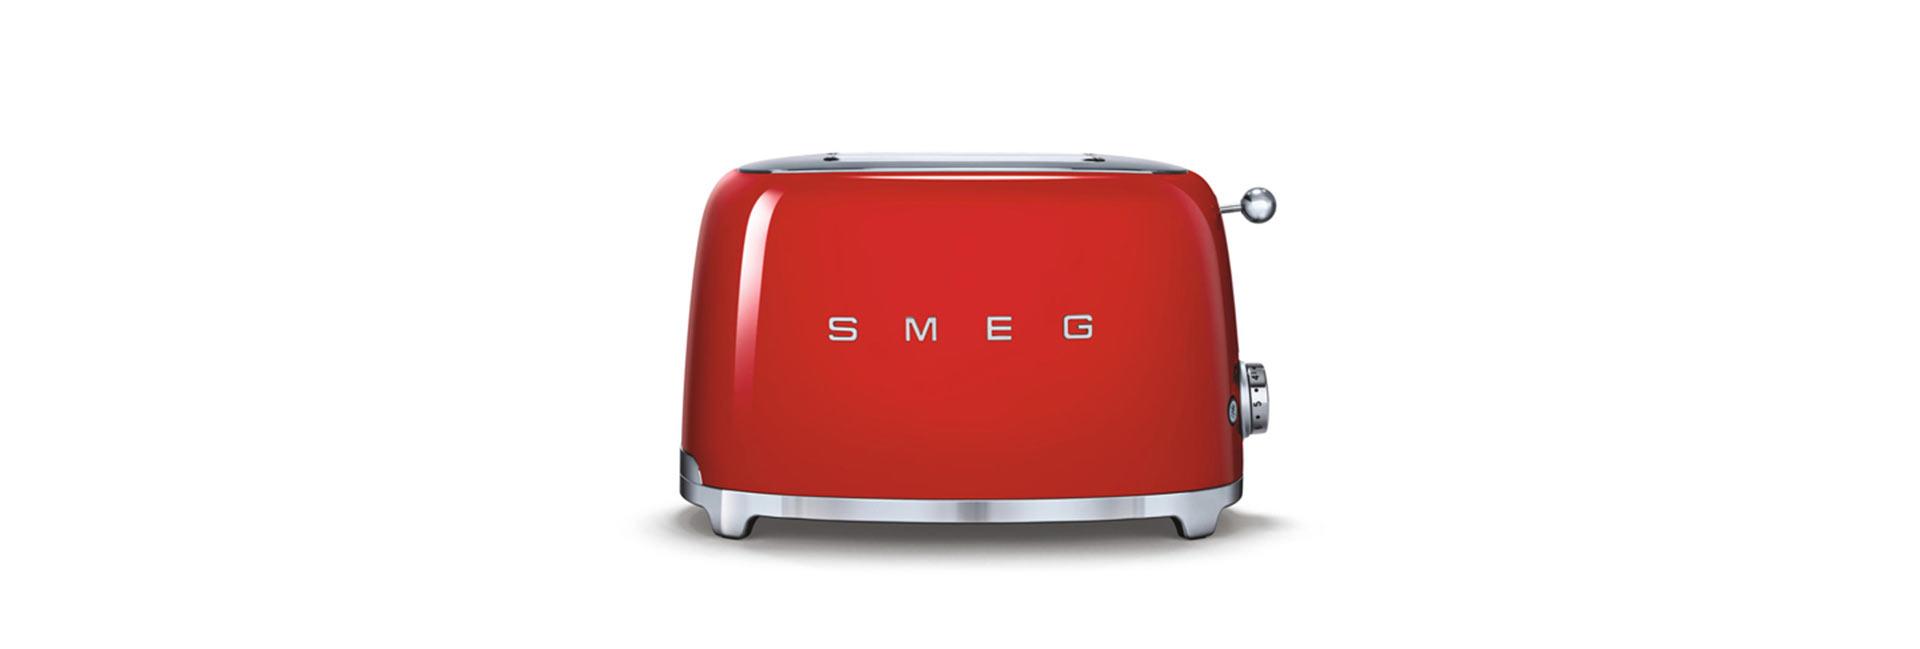 002_deepdesign_smeg_piccoli_toaster_photoby_Armin-Zogbaum